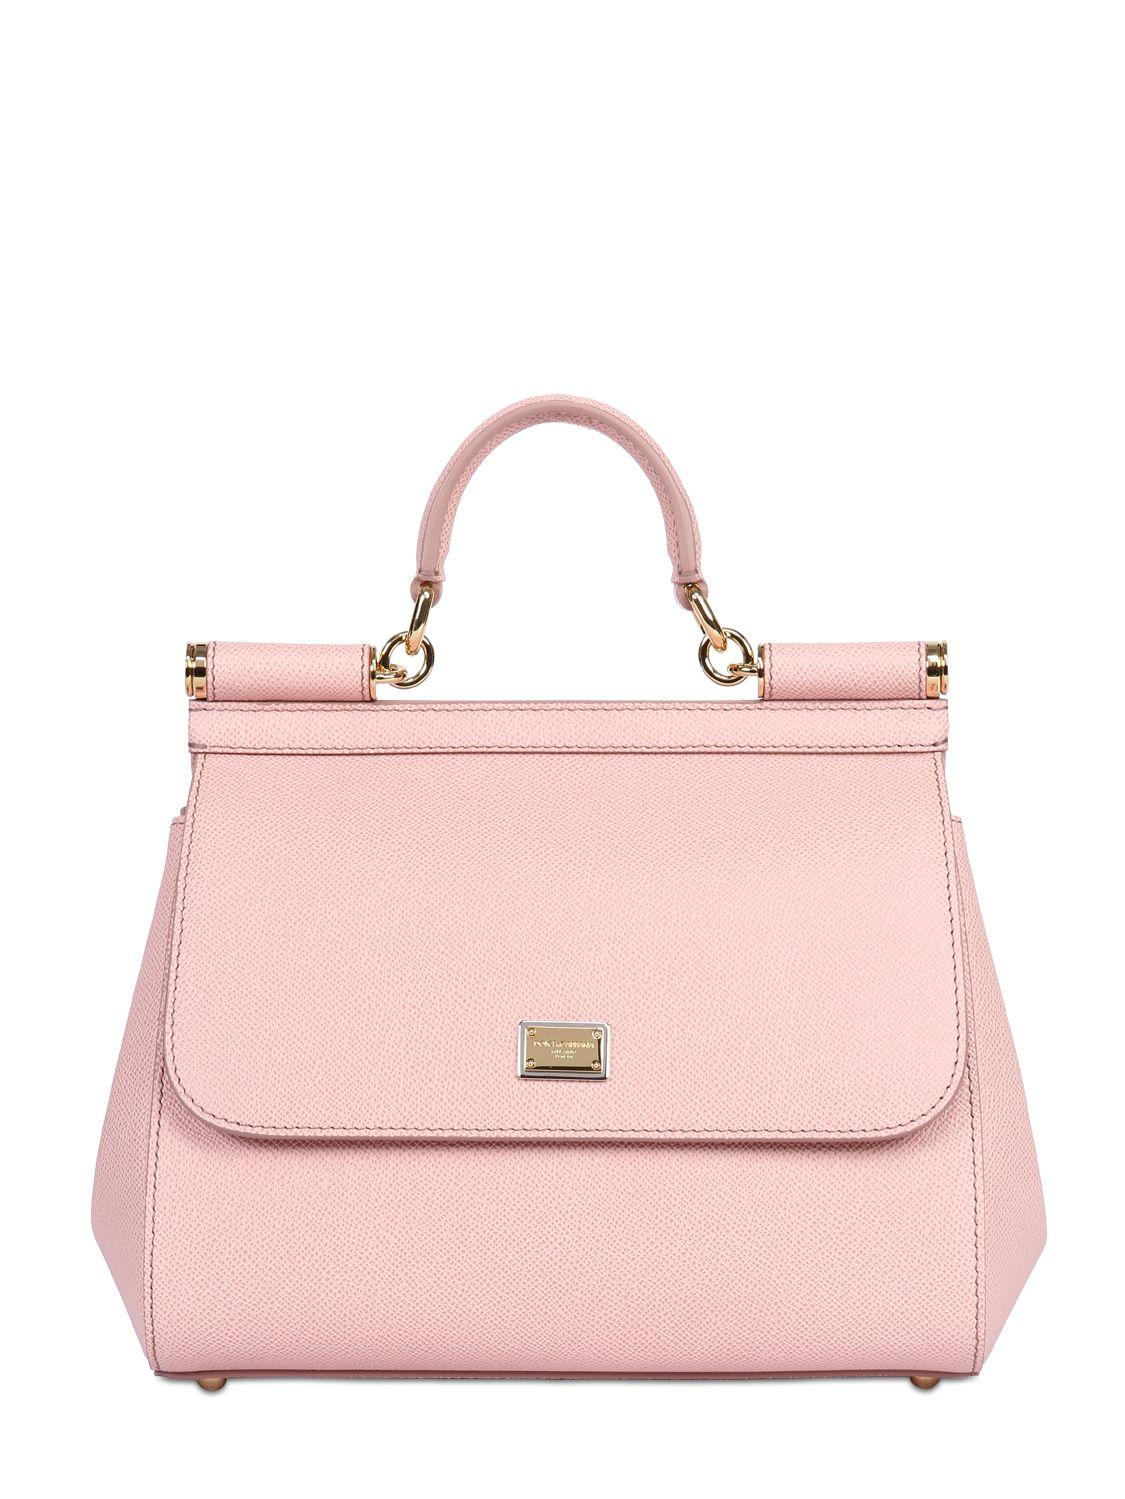 df4c1708d800f Dolce & Gabbana Medium Sicily Dauphine Leather Bag in Pink - Lyst